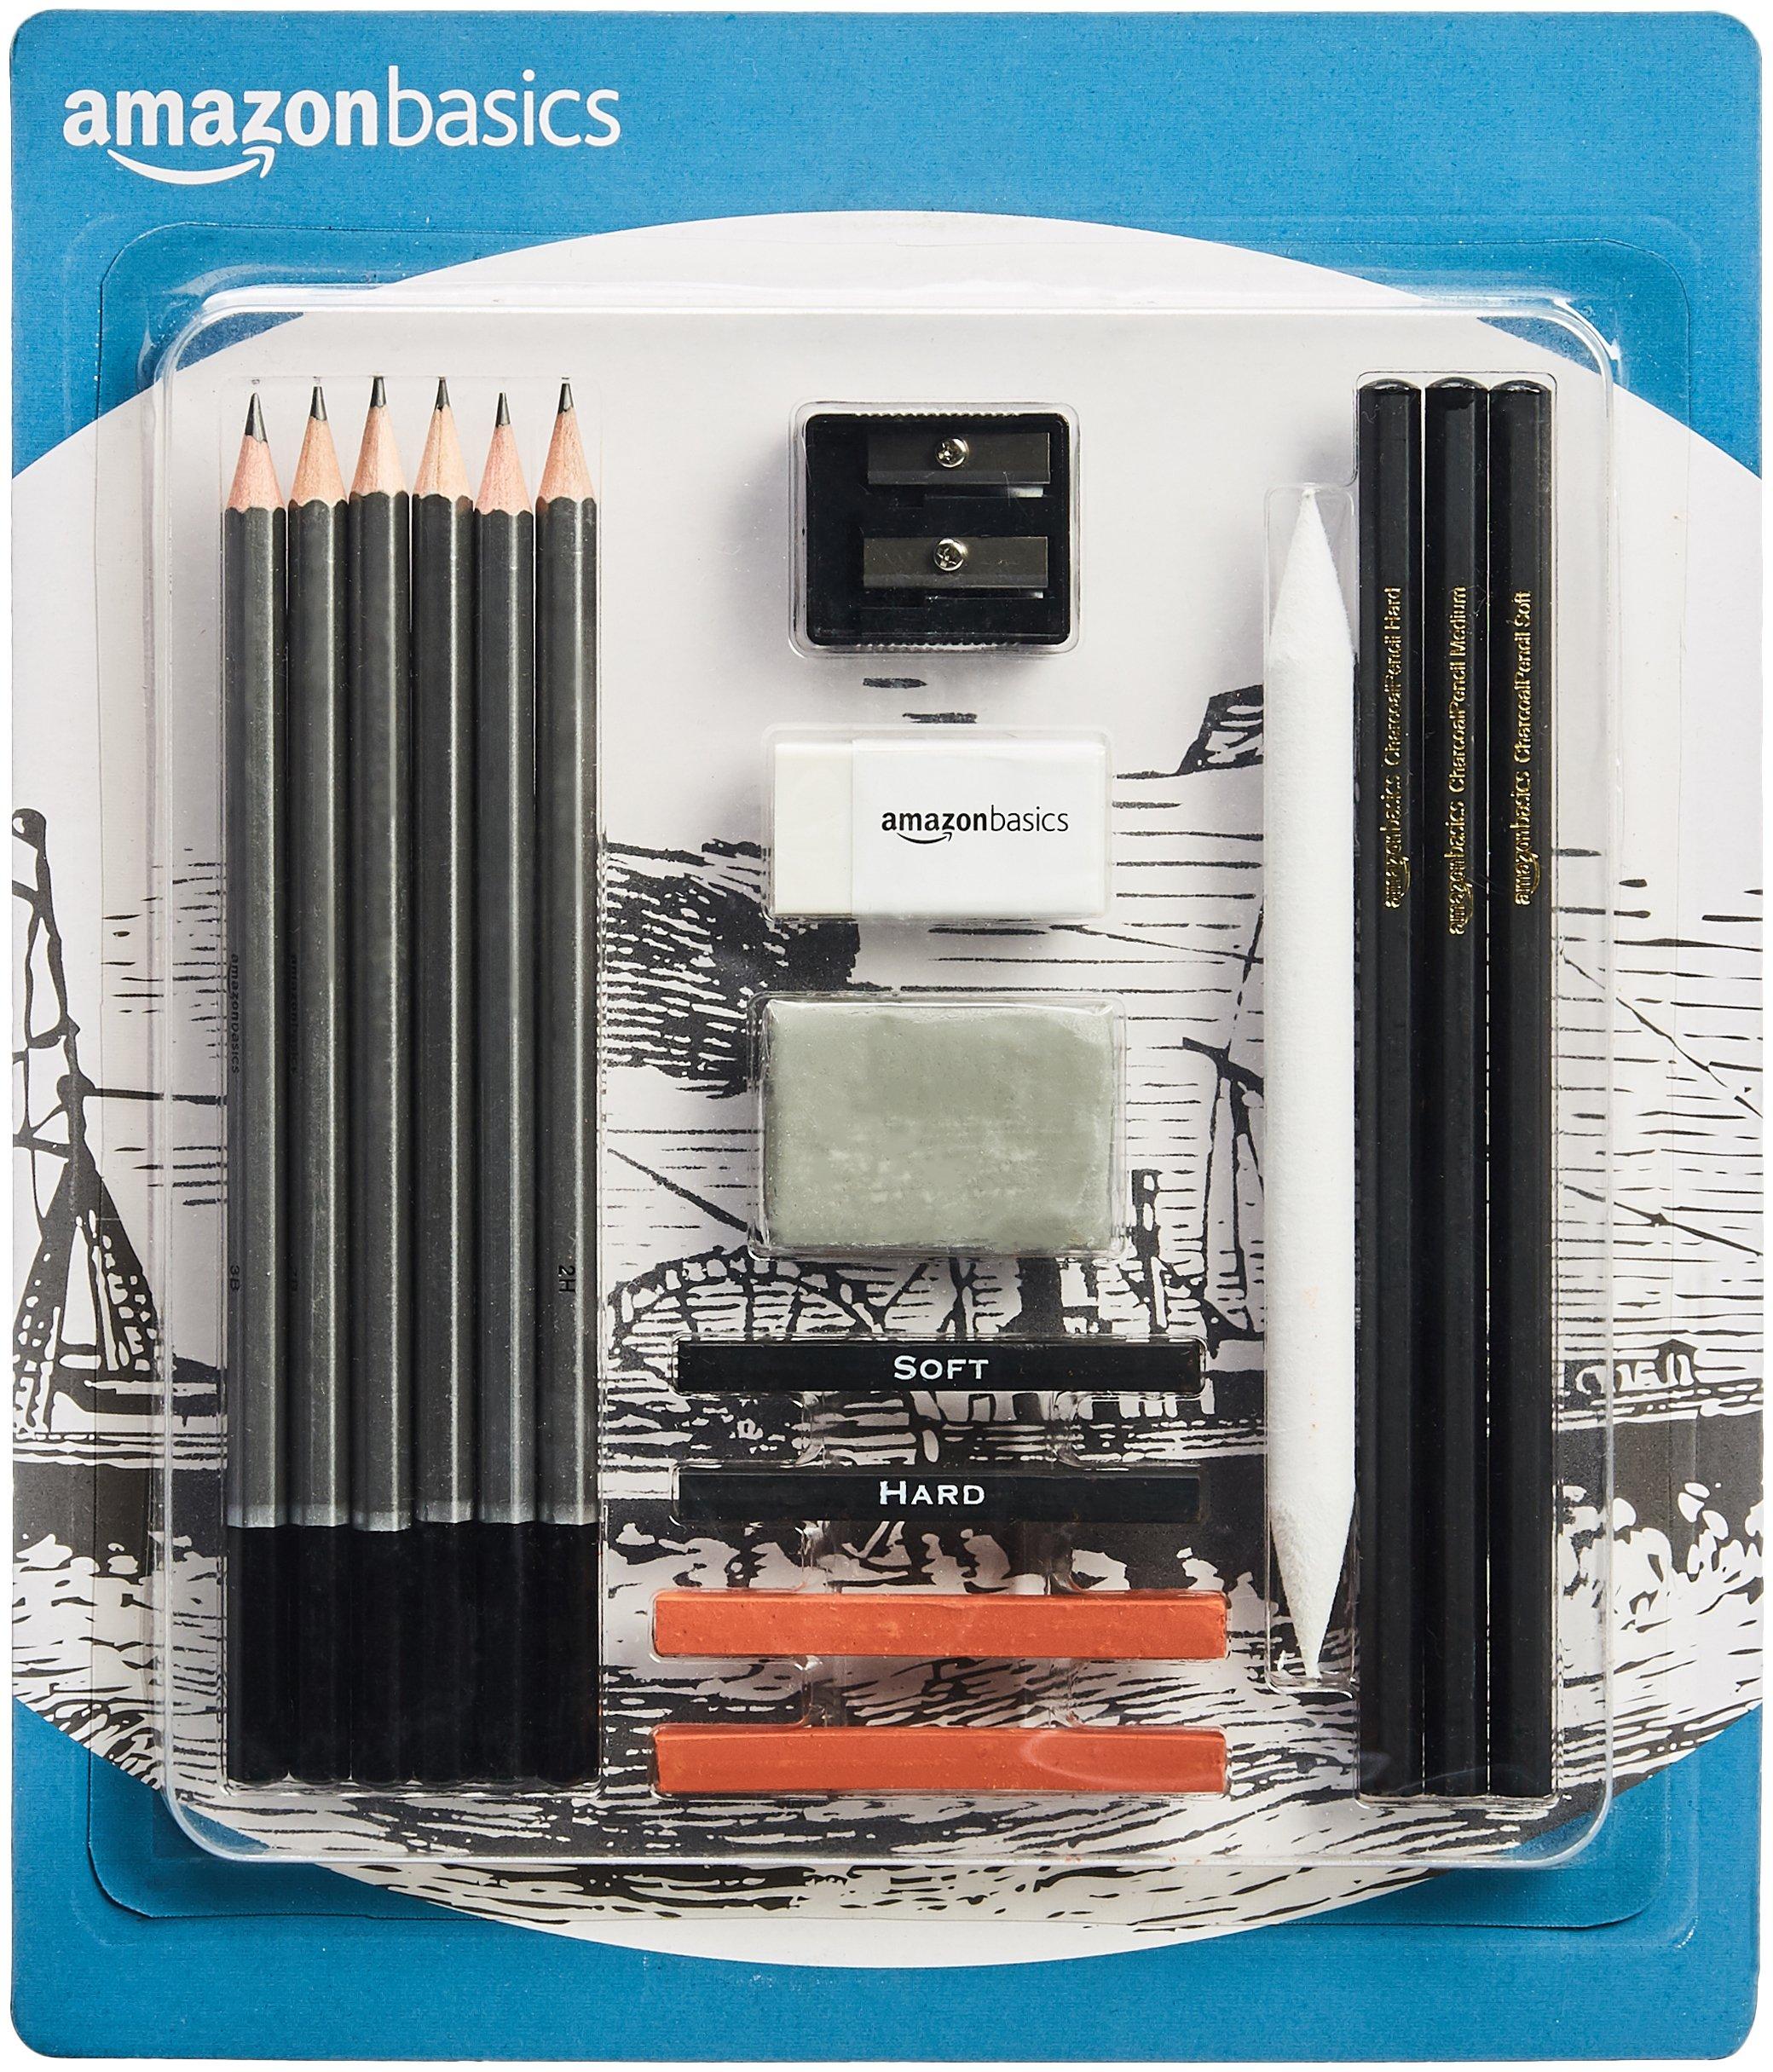 AmazonBasics Sketch and Drawing Art Pencil Kit - 17-Piece Set